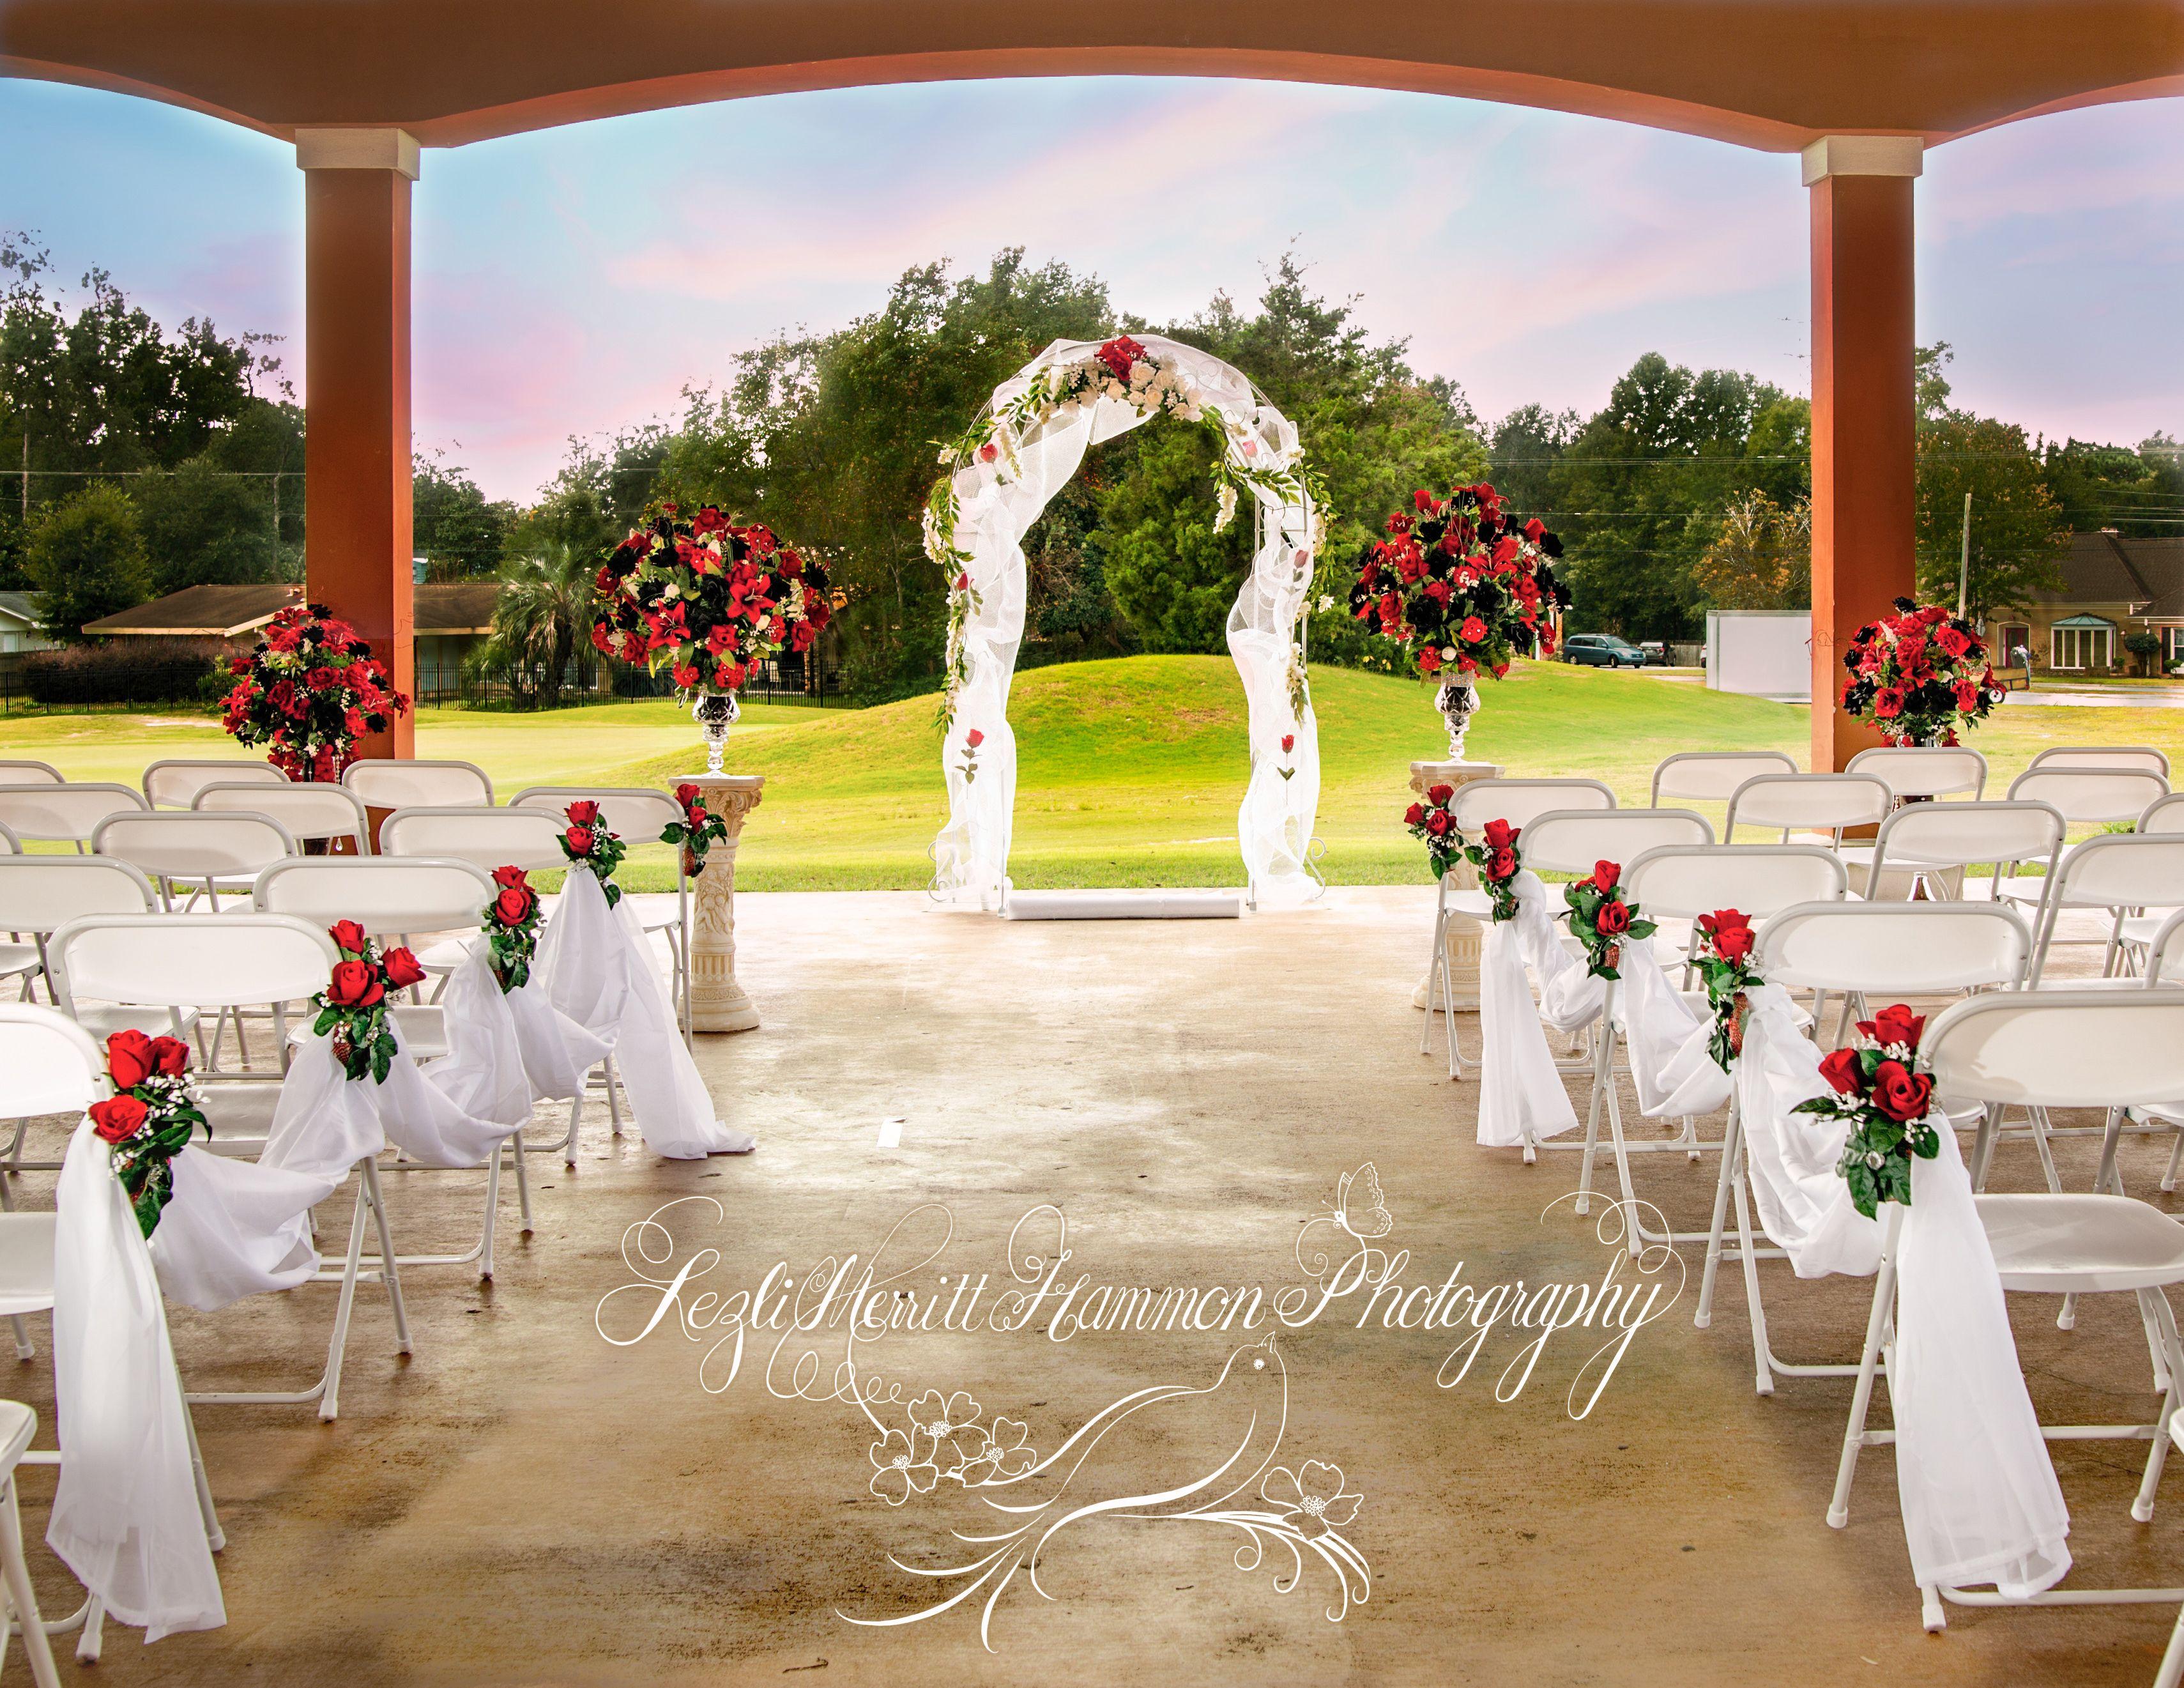 Pensacola Wedding Venue Scenic Hills Country Club Golf Themed Photographer Lezli Merritt Hammon Photography